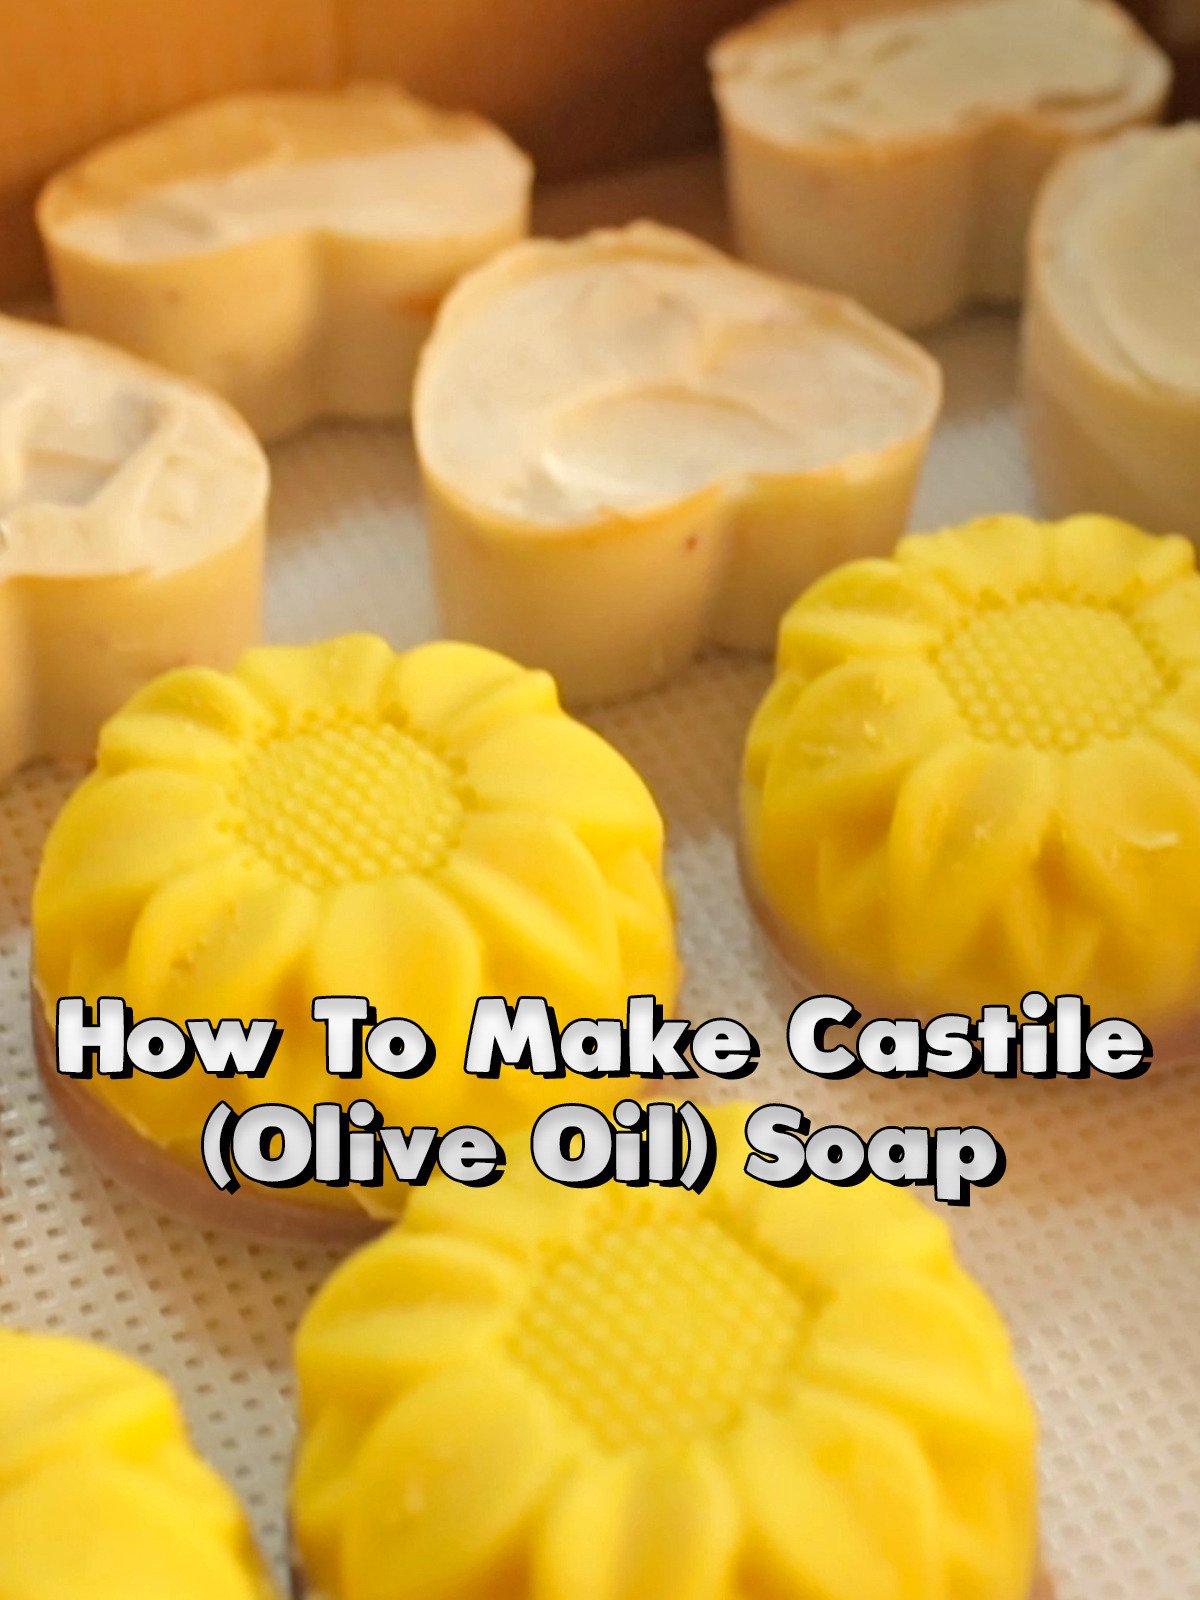 How To Make Castile (Olive Oil) Soap on Amazon Prime Video UK